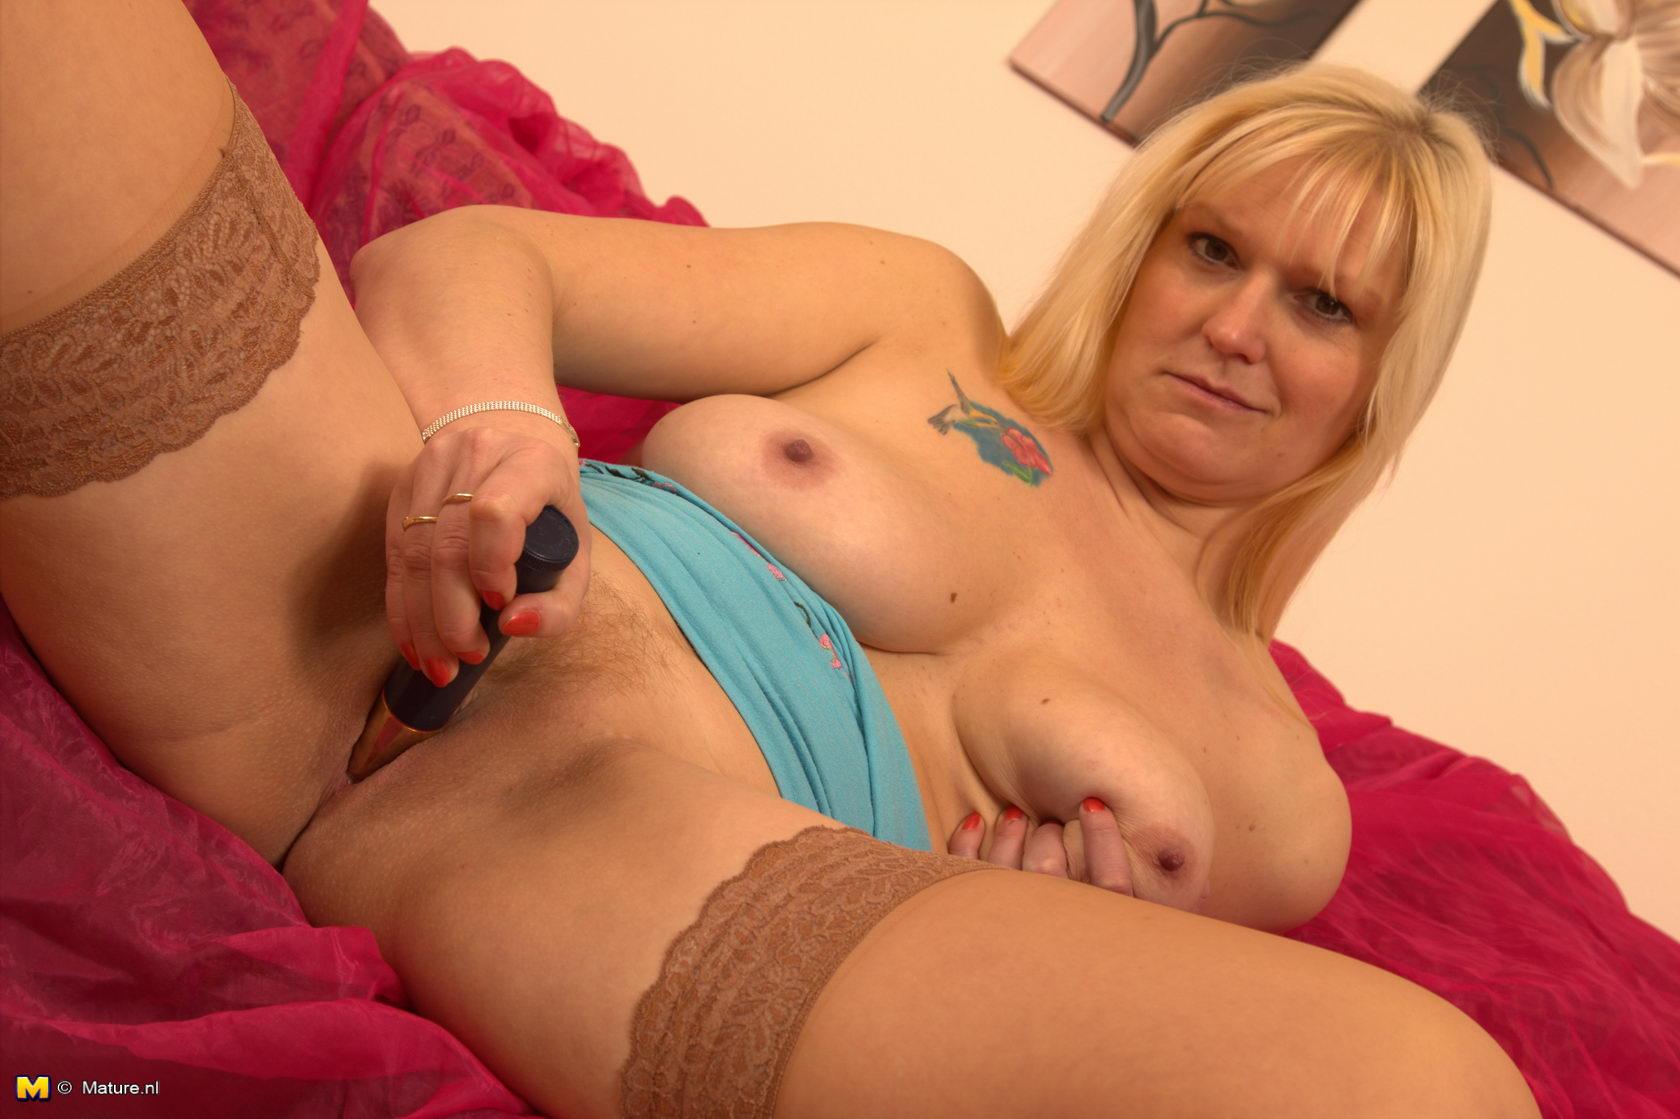 Huge breasted sluts